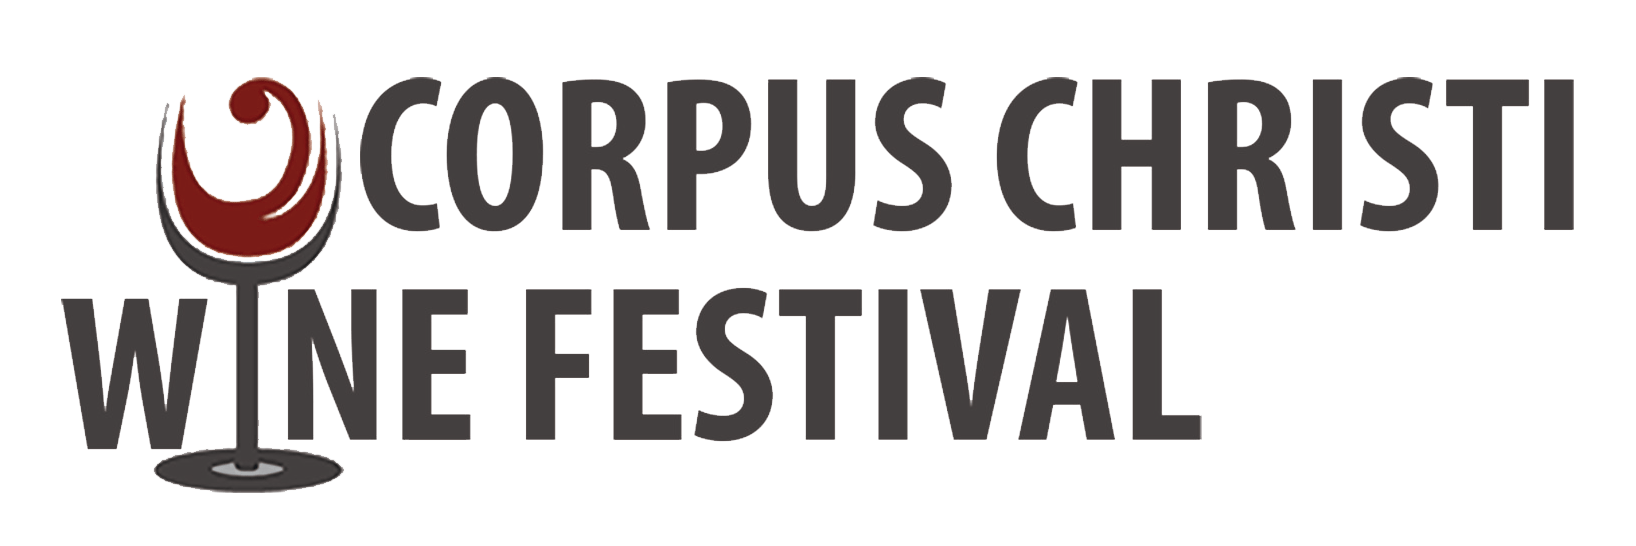 Corpus Christi Food & Wine Festival — A Classy Festival for Everyone